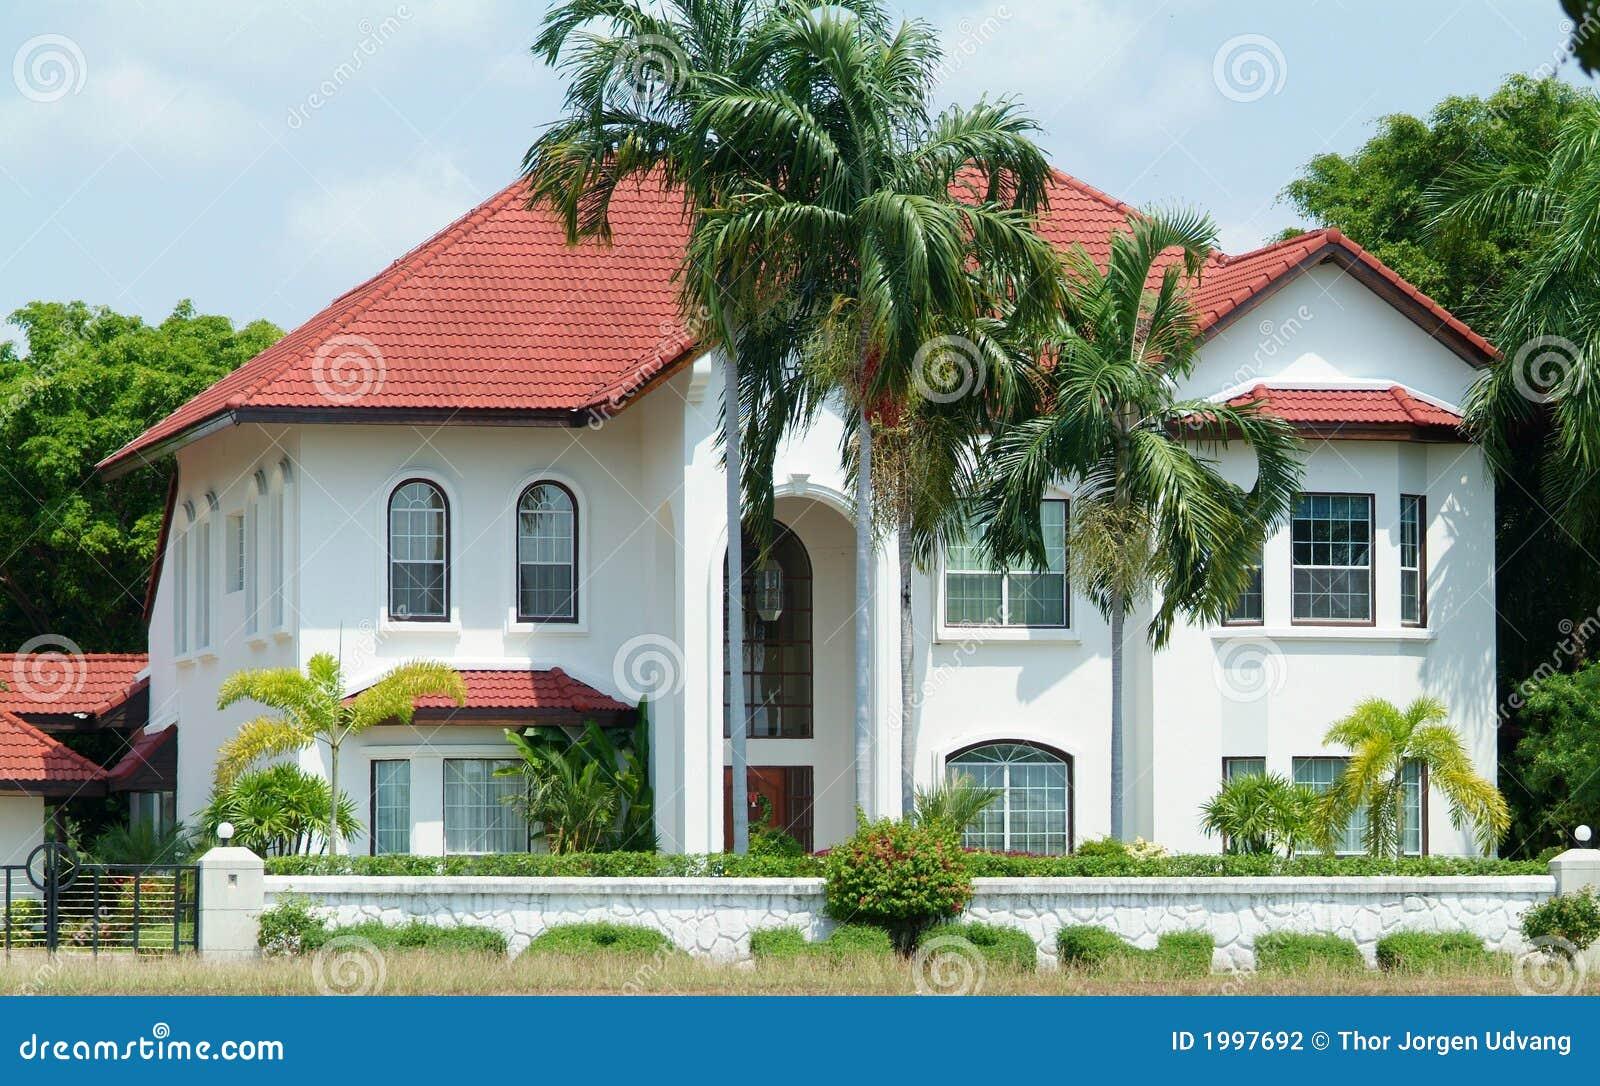 Plan Villa De Luxe  Villa de luxe blanche dans le climat tropical